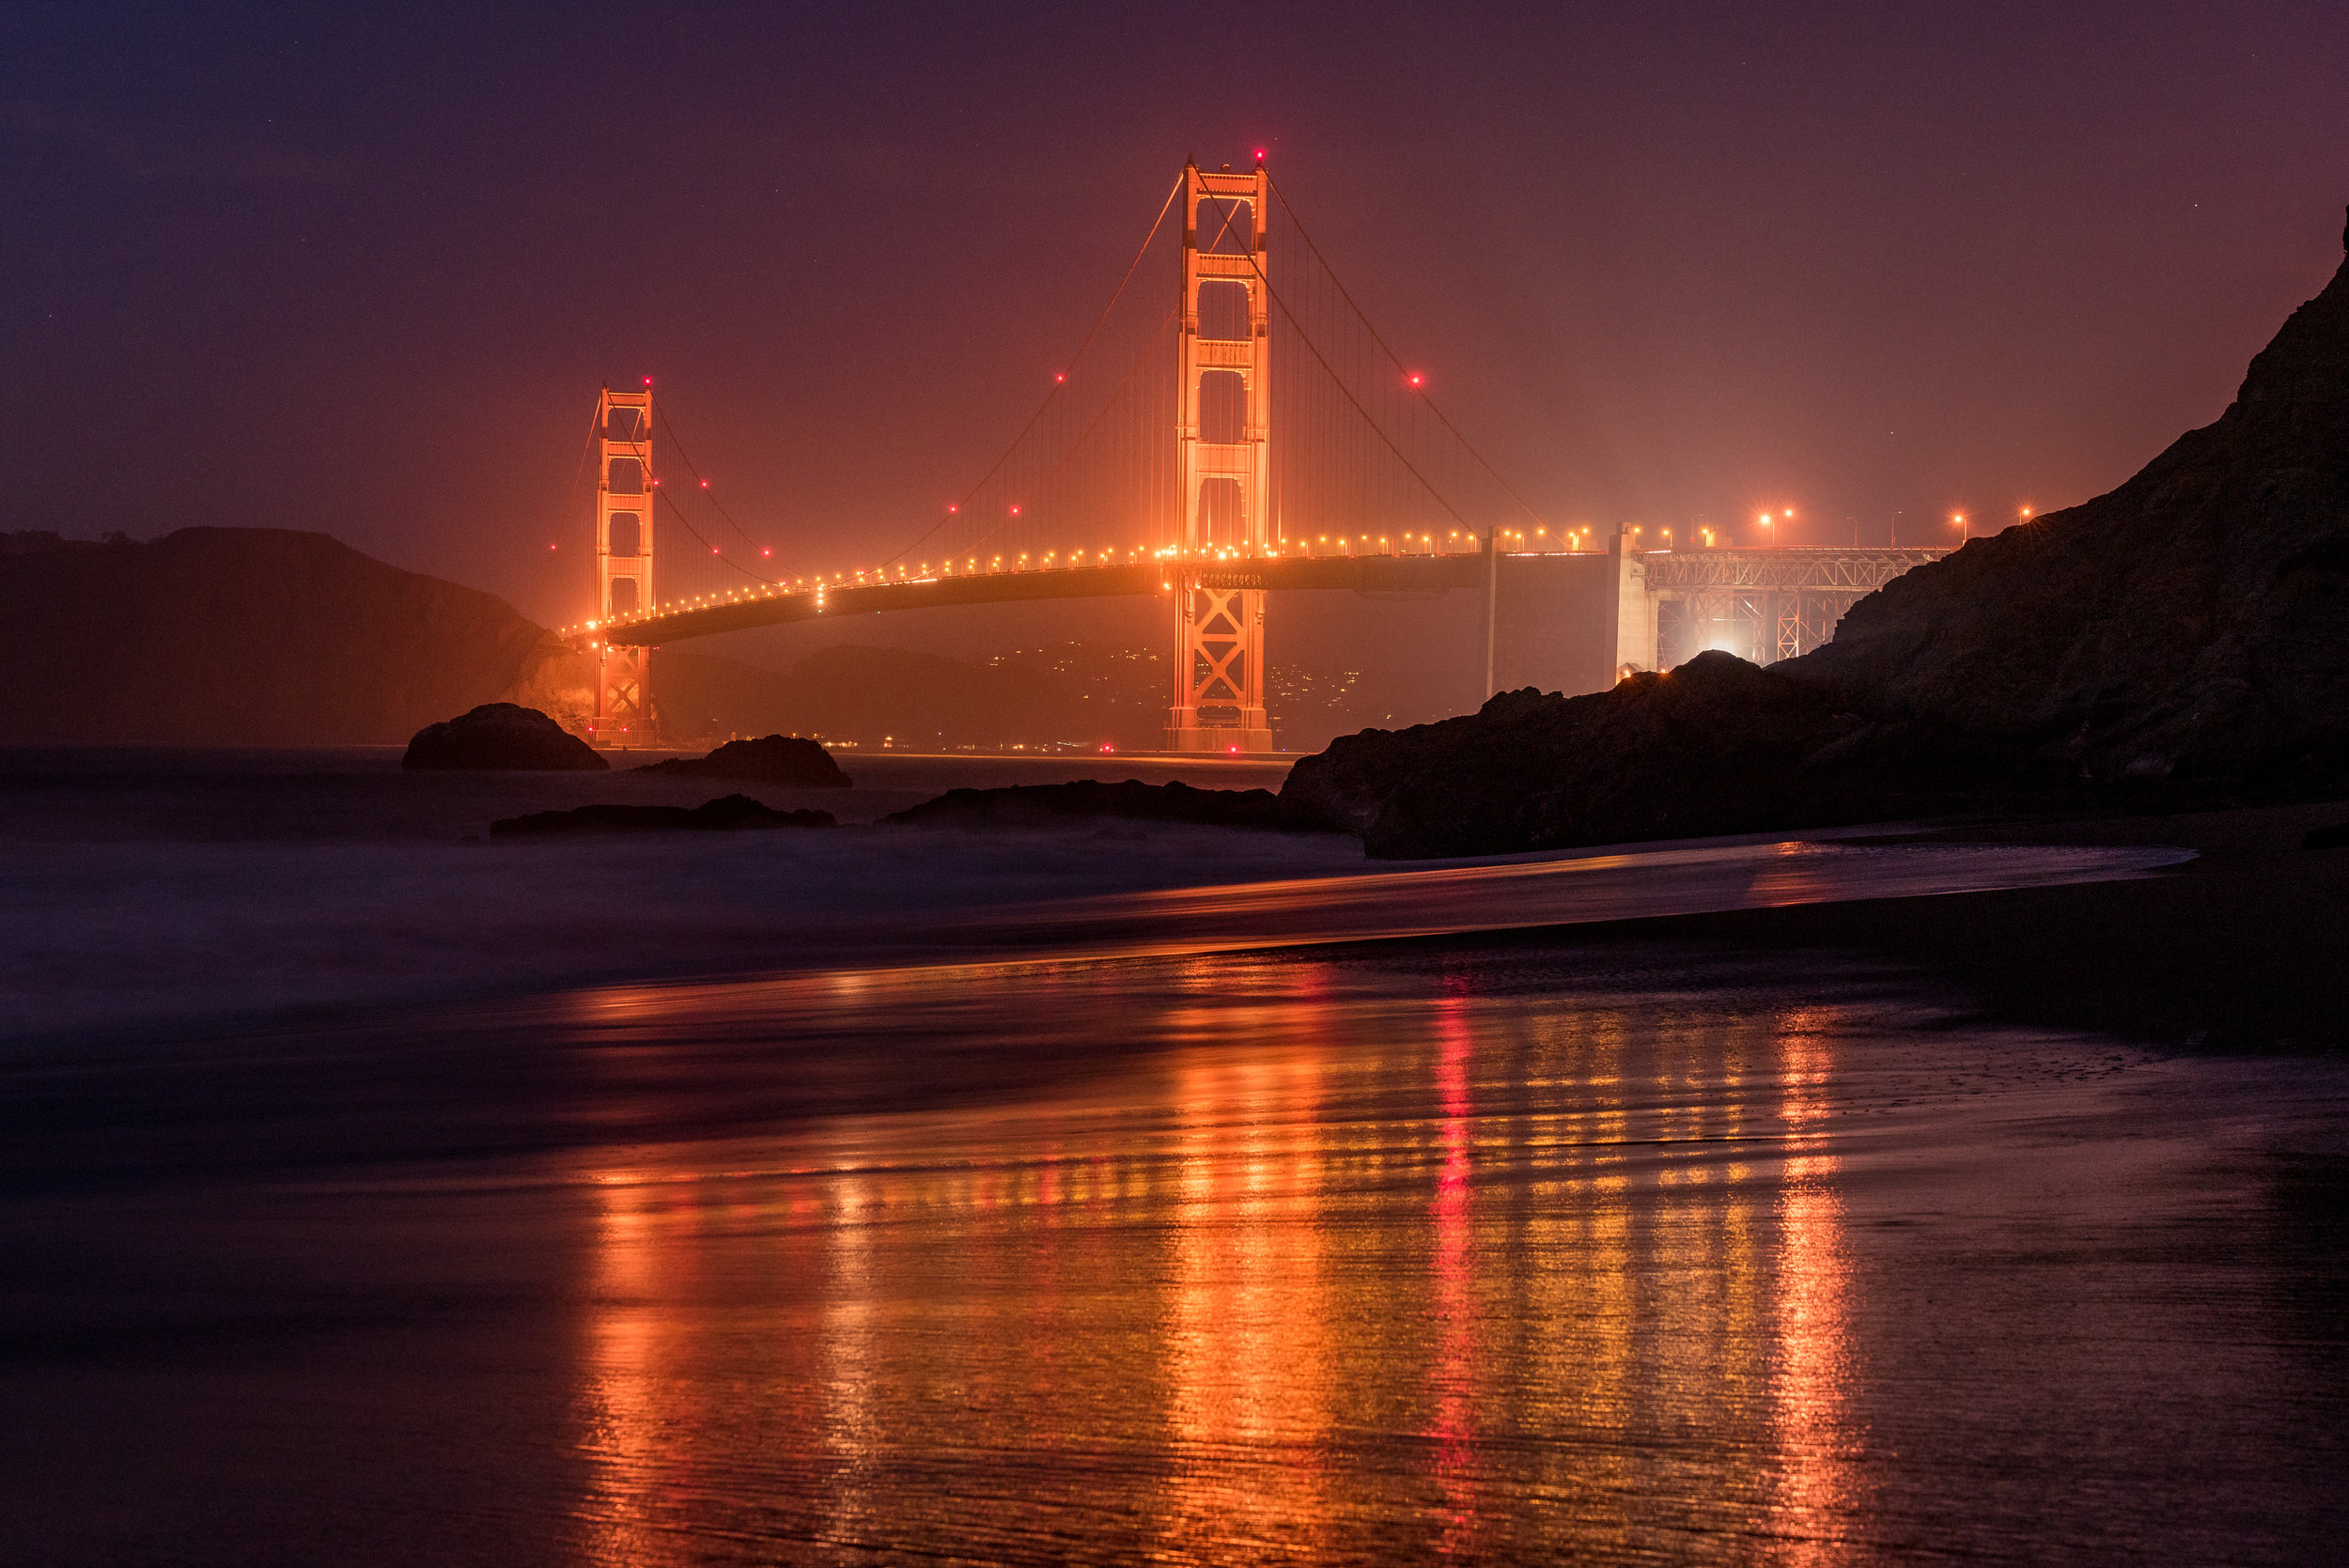 Golden Gate Reflections